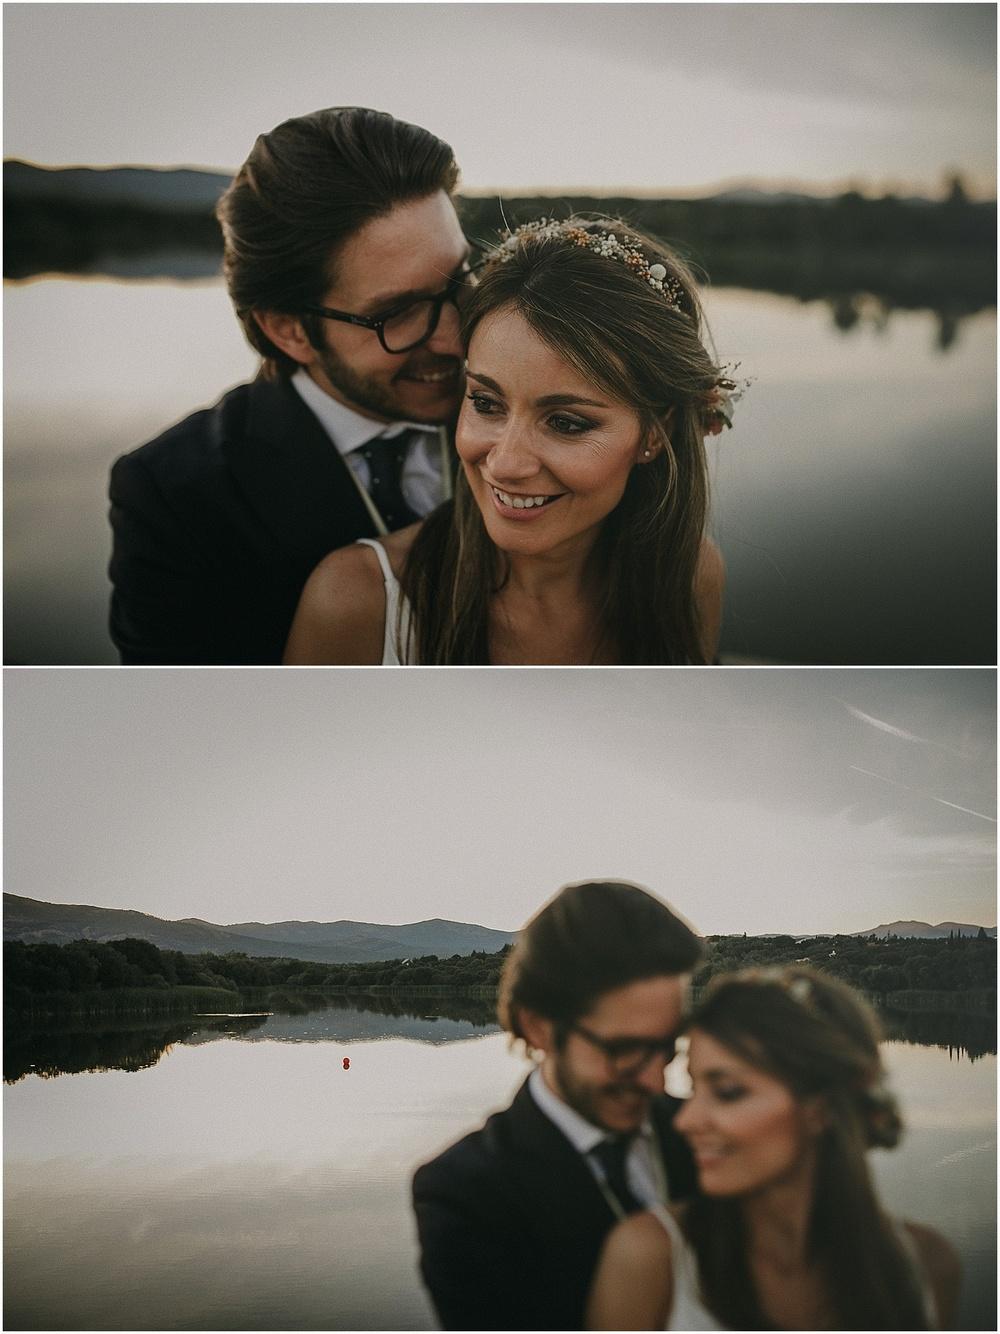 Macarena y Jordi - boda en valencia - Pablo Laguia (34).jpg